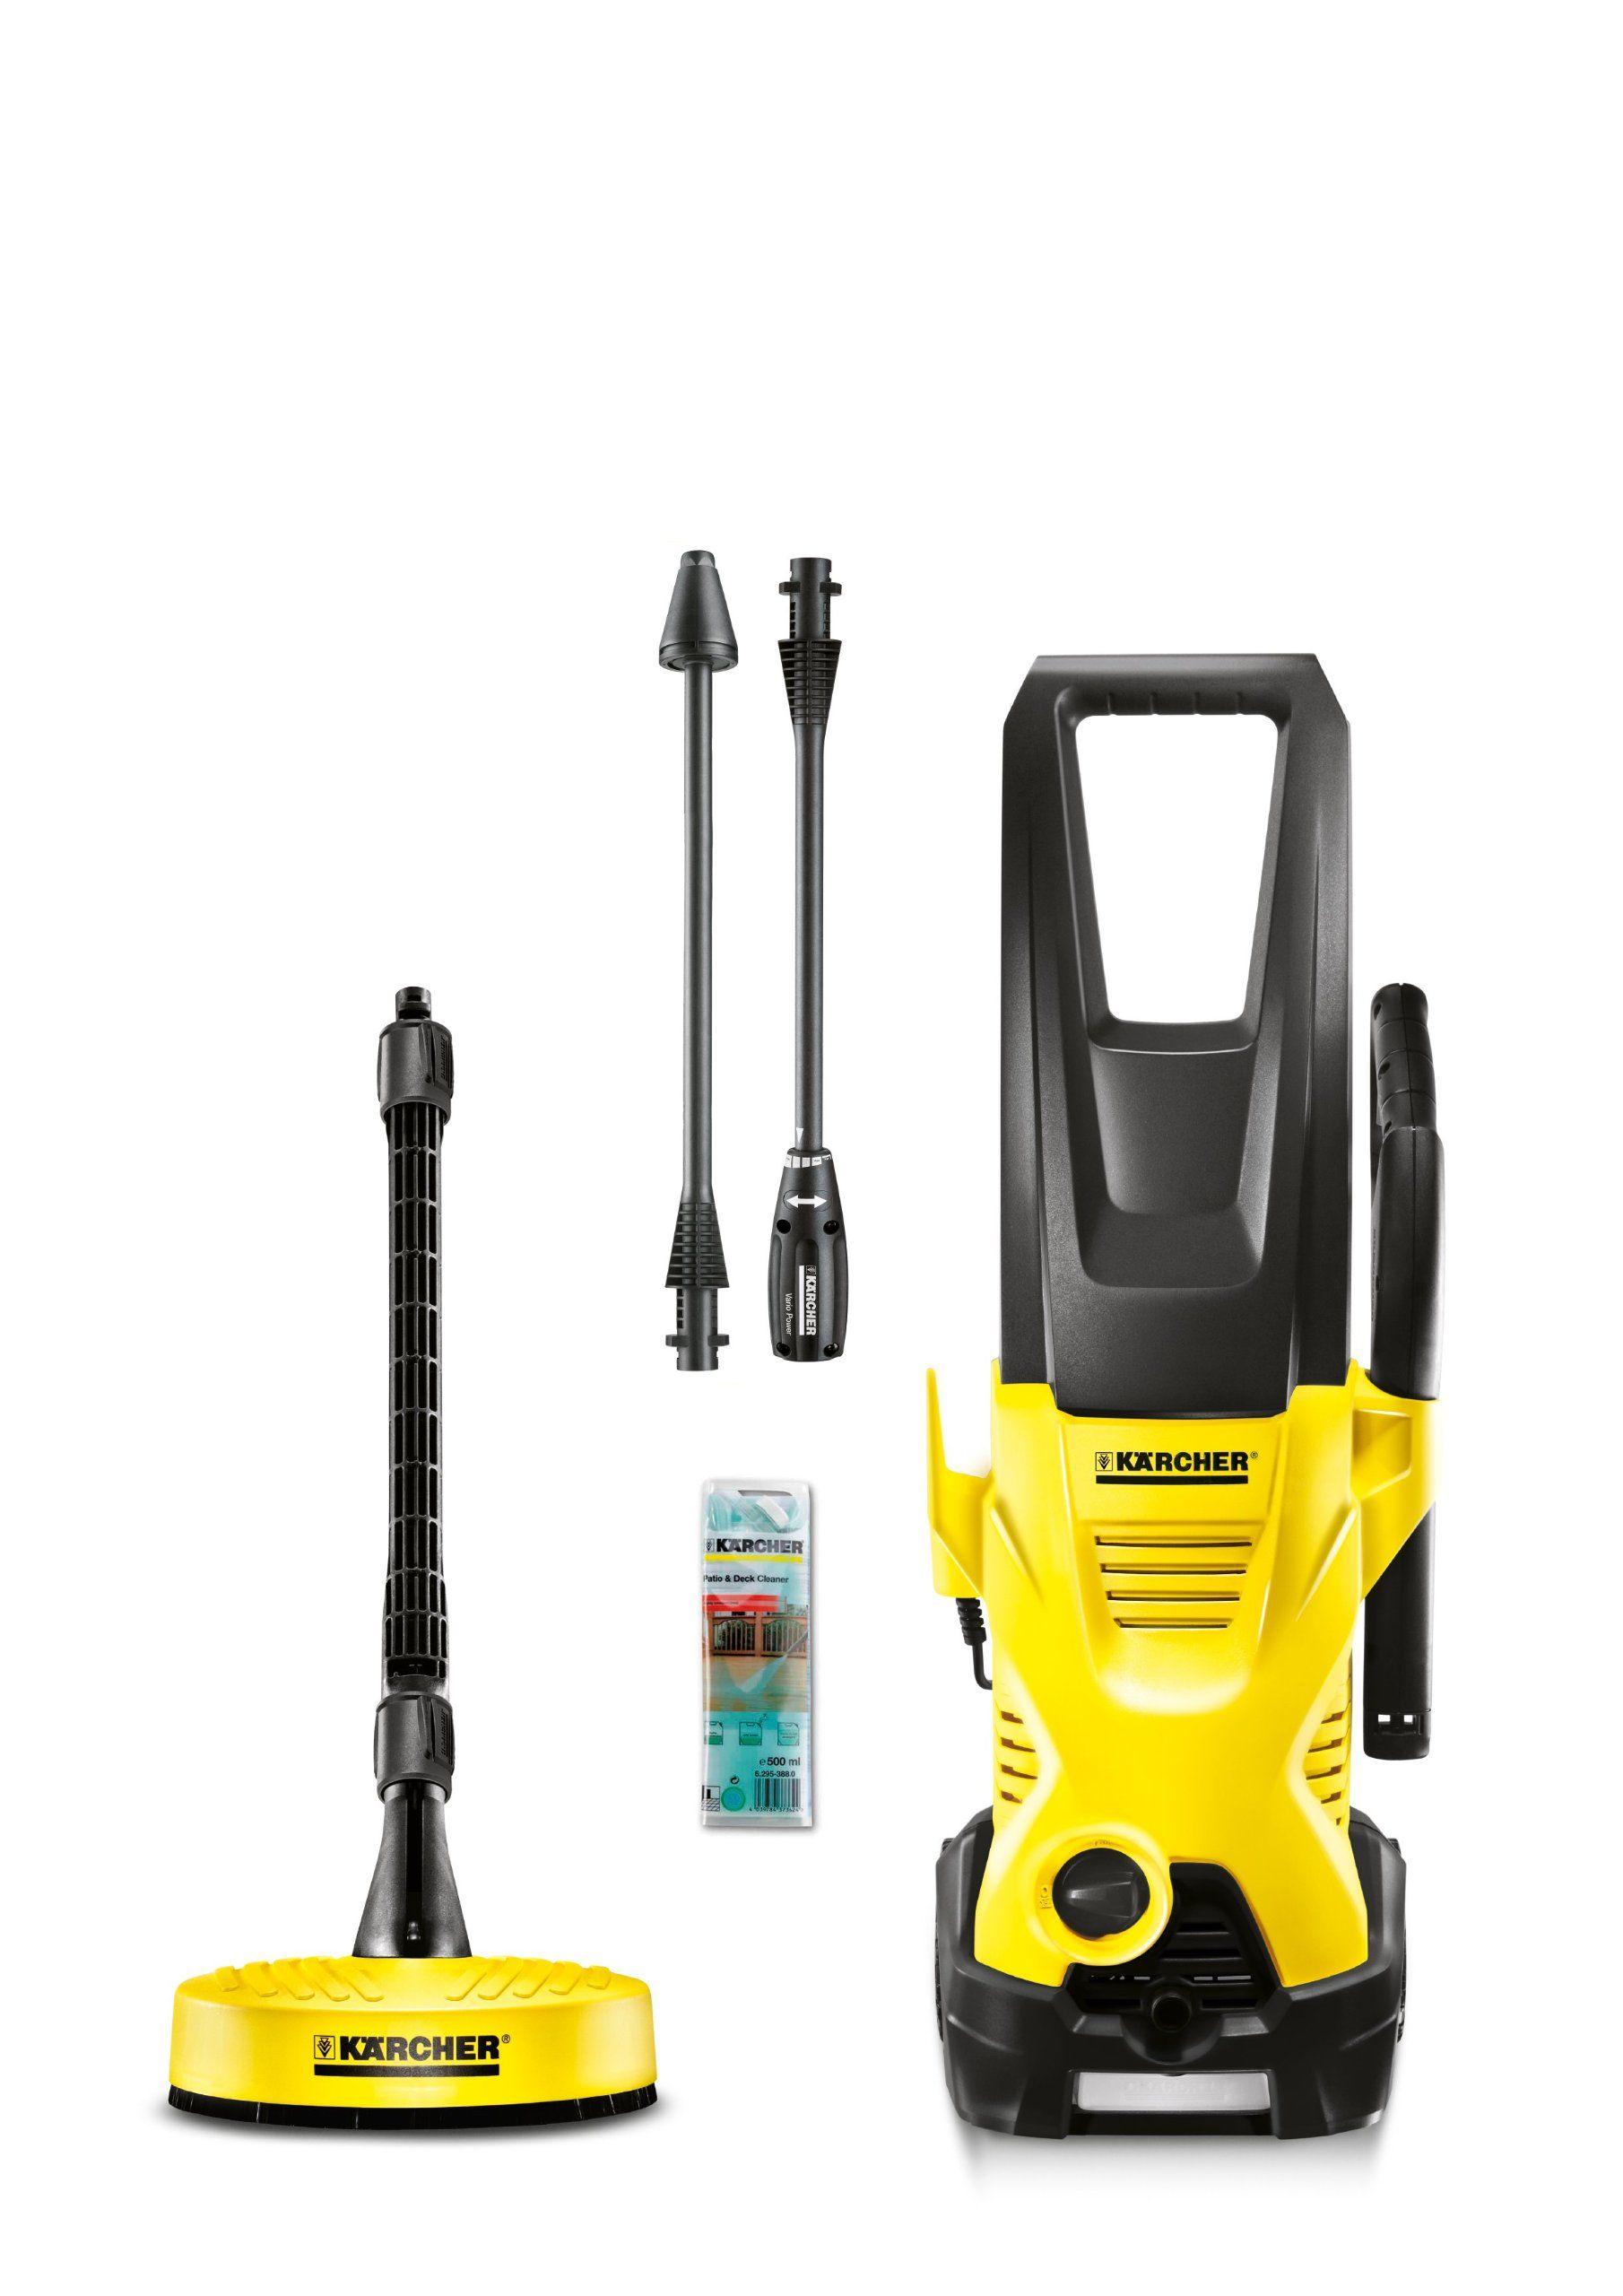 Karcher K2 Premium Home Air Cooled Pressure Washer Pressure Washer Cleaning Equipment Garden Power Tools